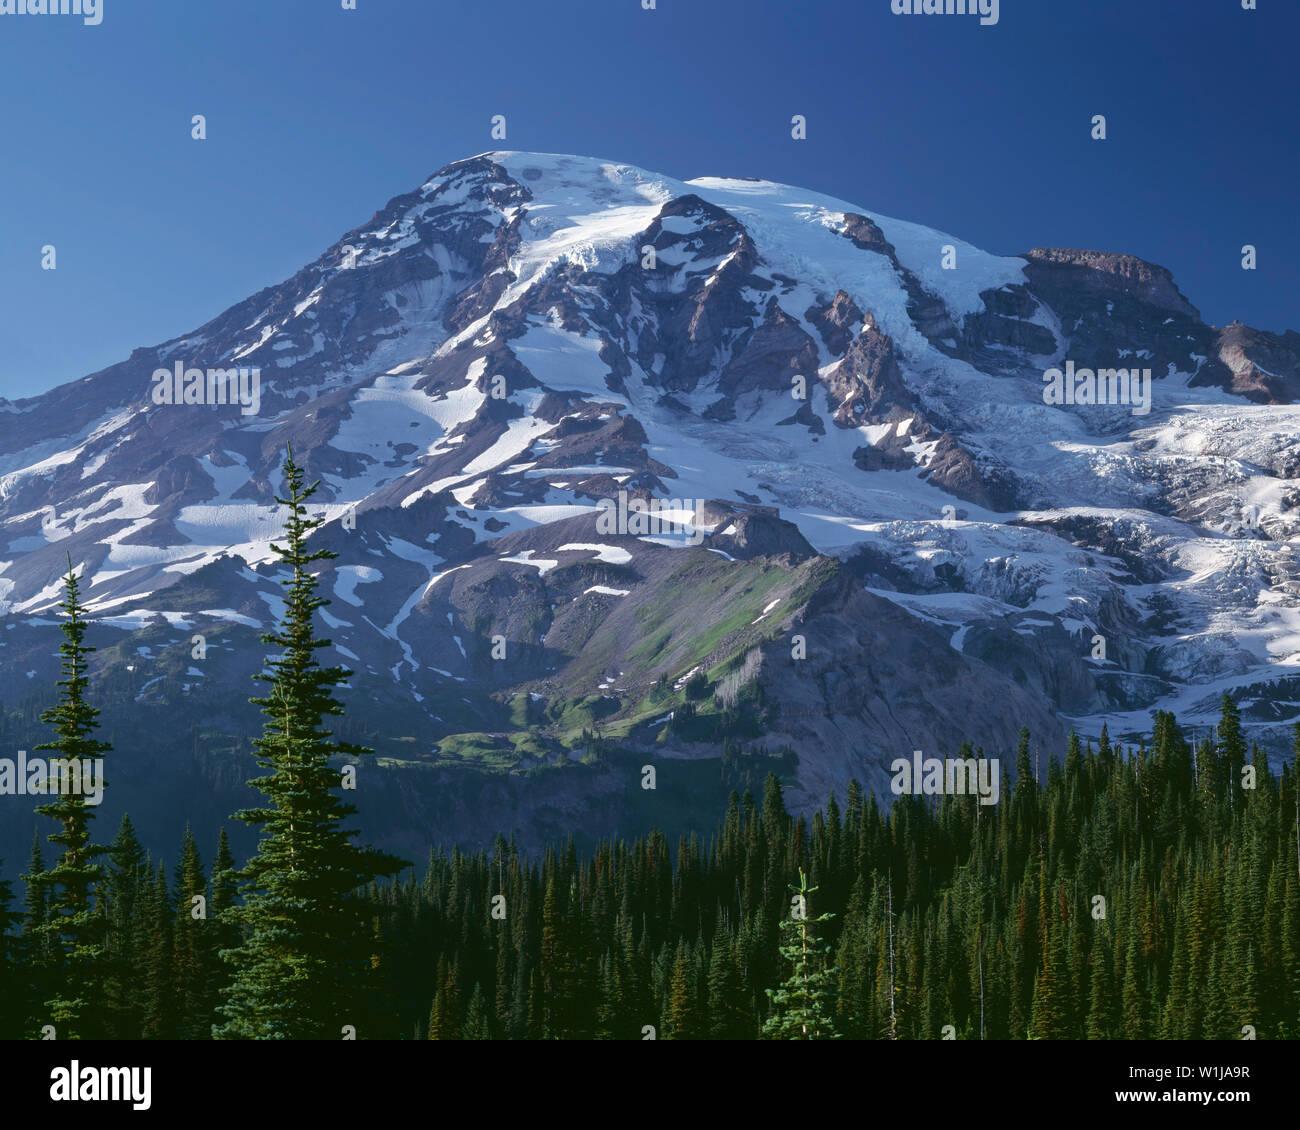 USA, Washington, Mt. Rainier National Park, South side of Mt. Rainier and evergreen forest, Paradise area. - Stock Image